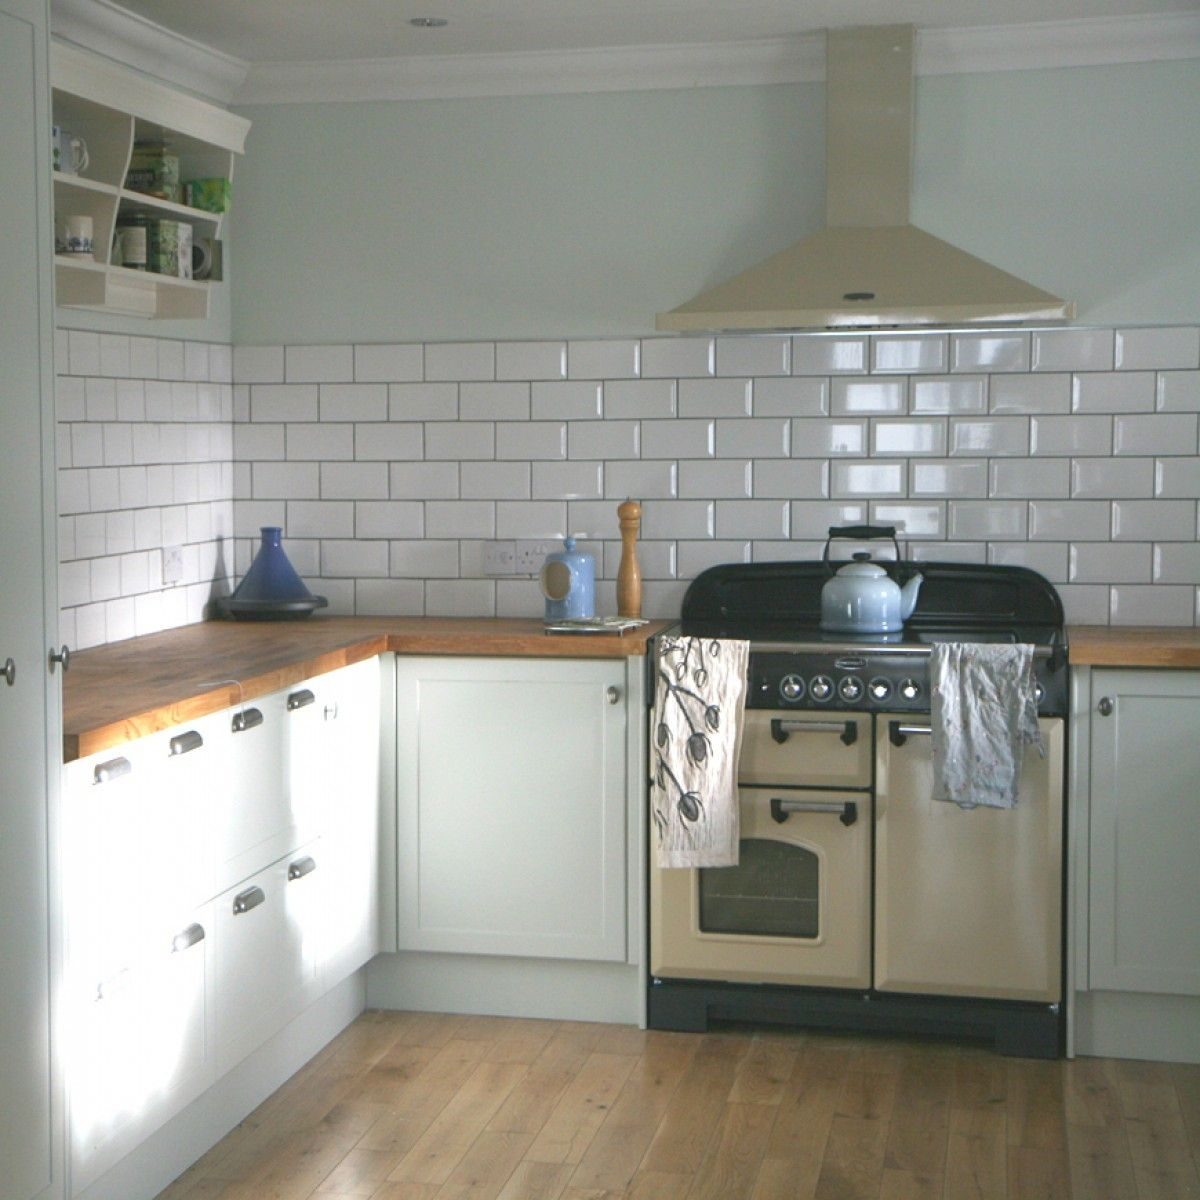 white subway tile in modern kitchen  Google Search